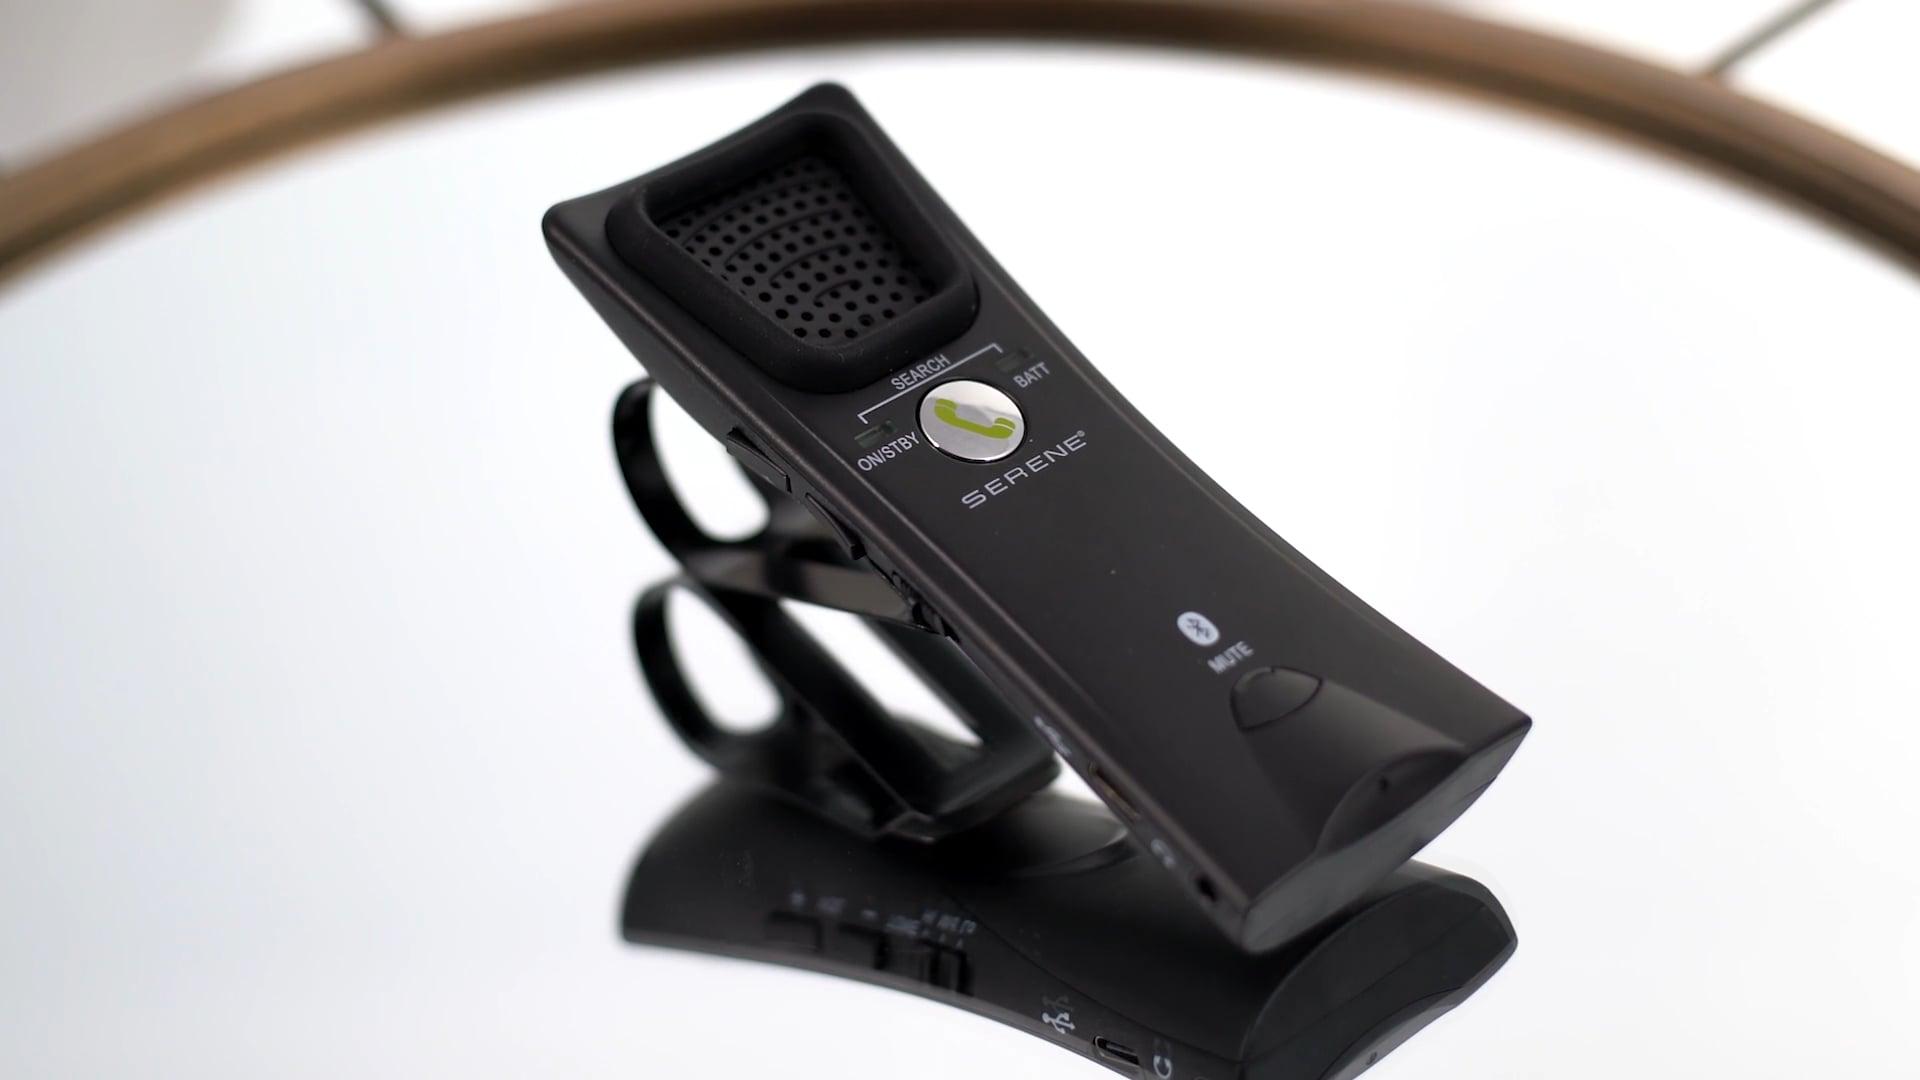 Serene Cell Phone Amplifier